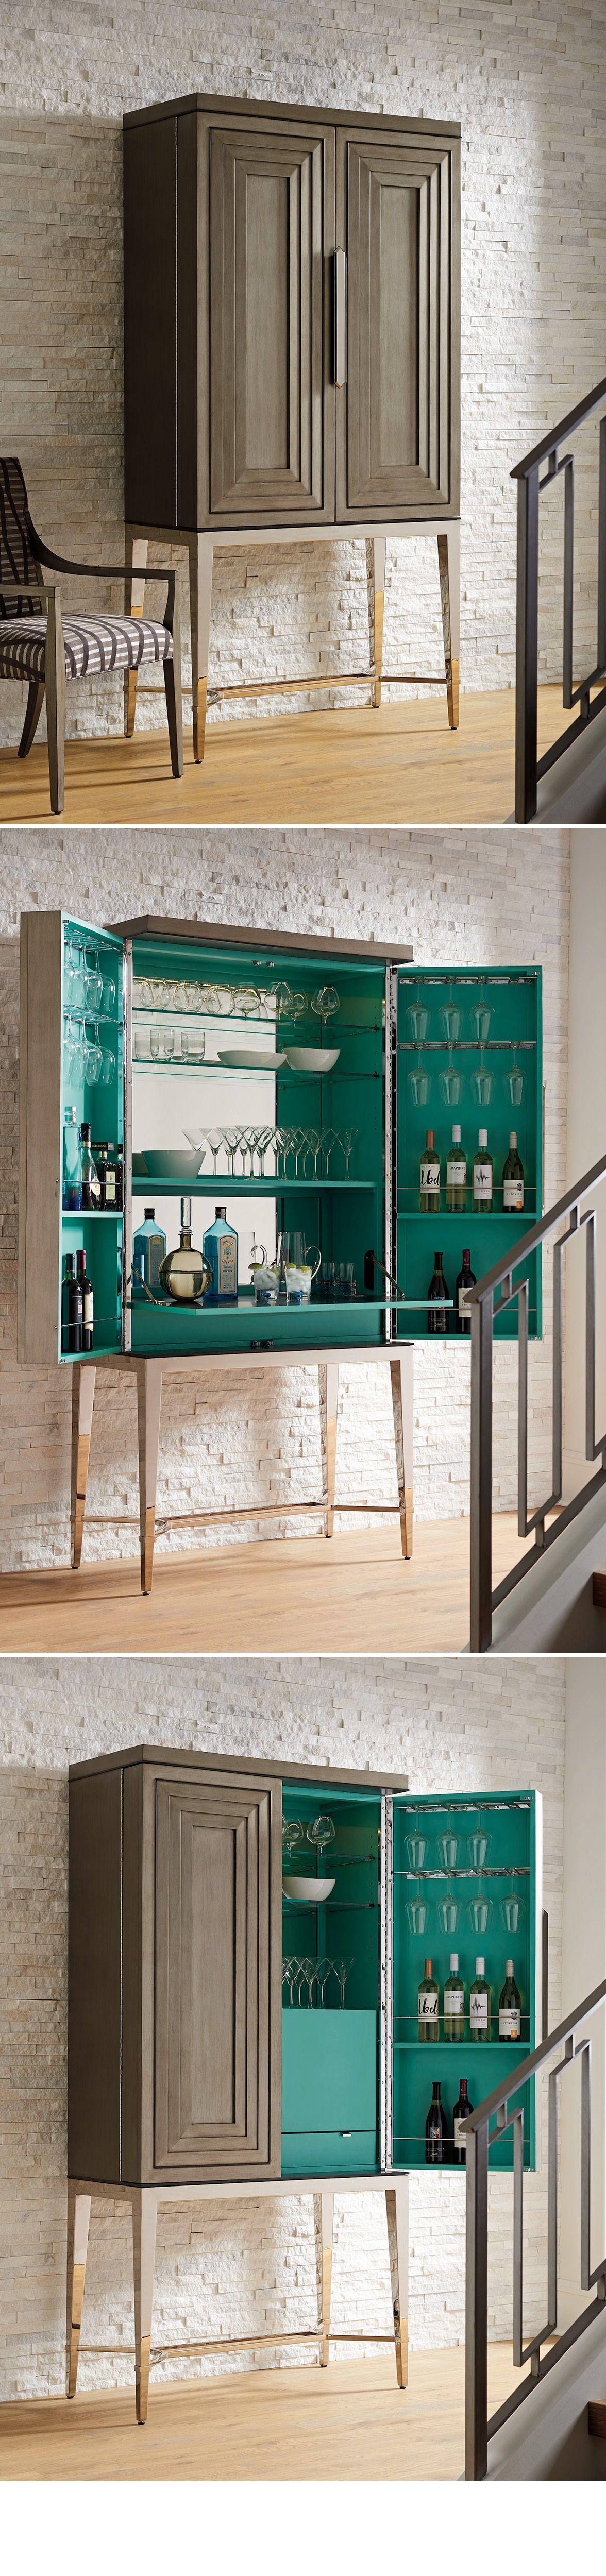 Elegant Mini Bar | Drinks Cabinet | Mini Bars | Bar Cabinet | Bar Cabinets | Hotel